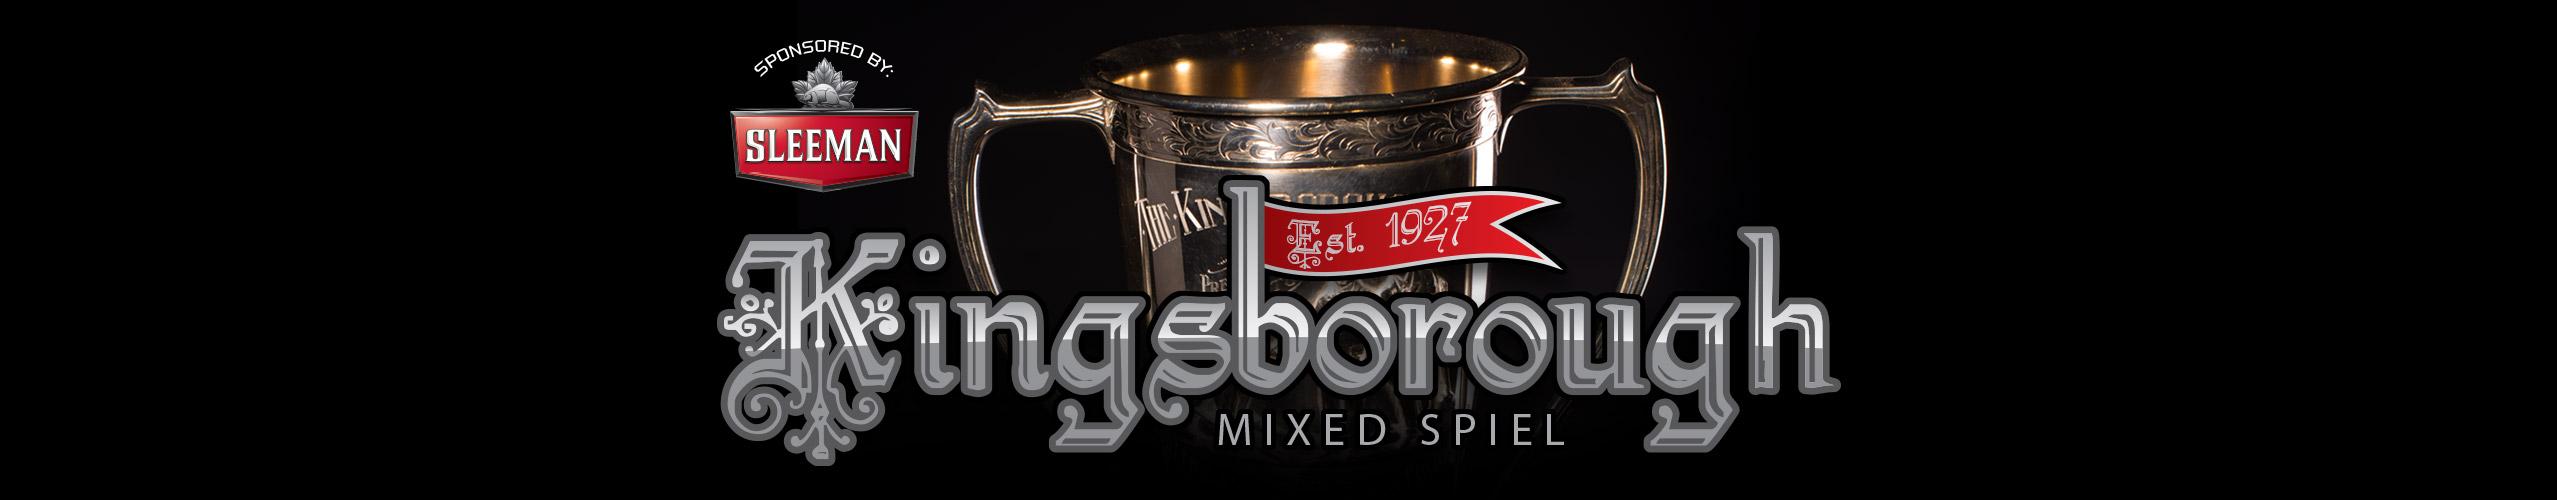 kingsborough-Cup-Banner-3